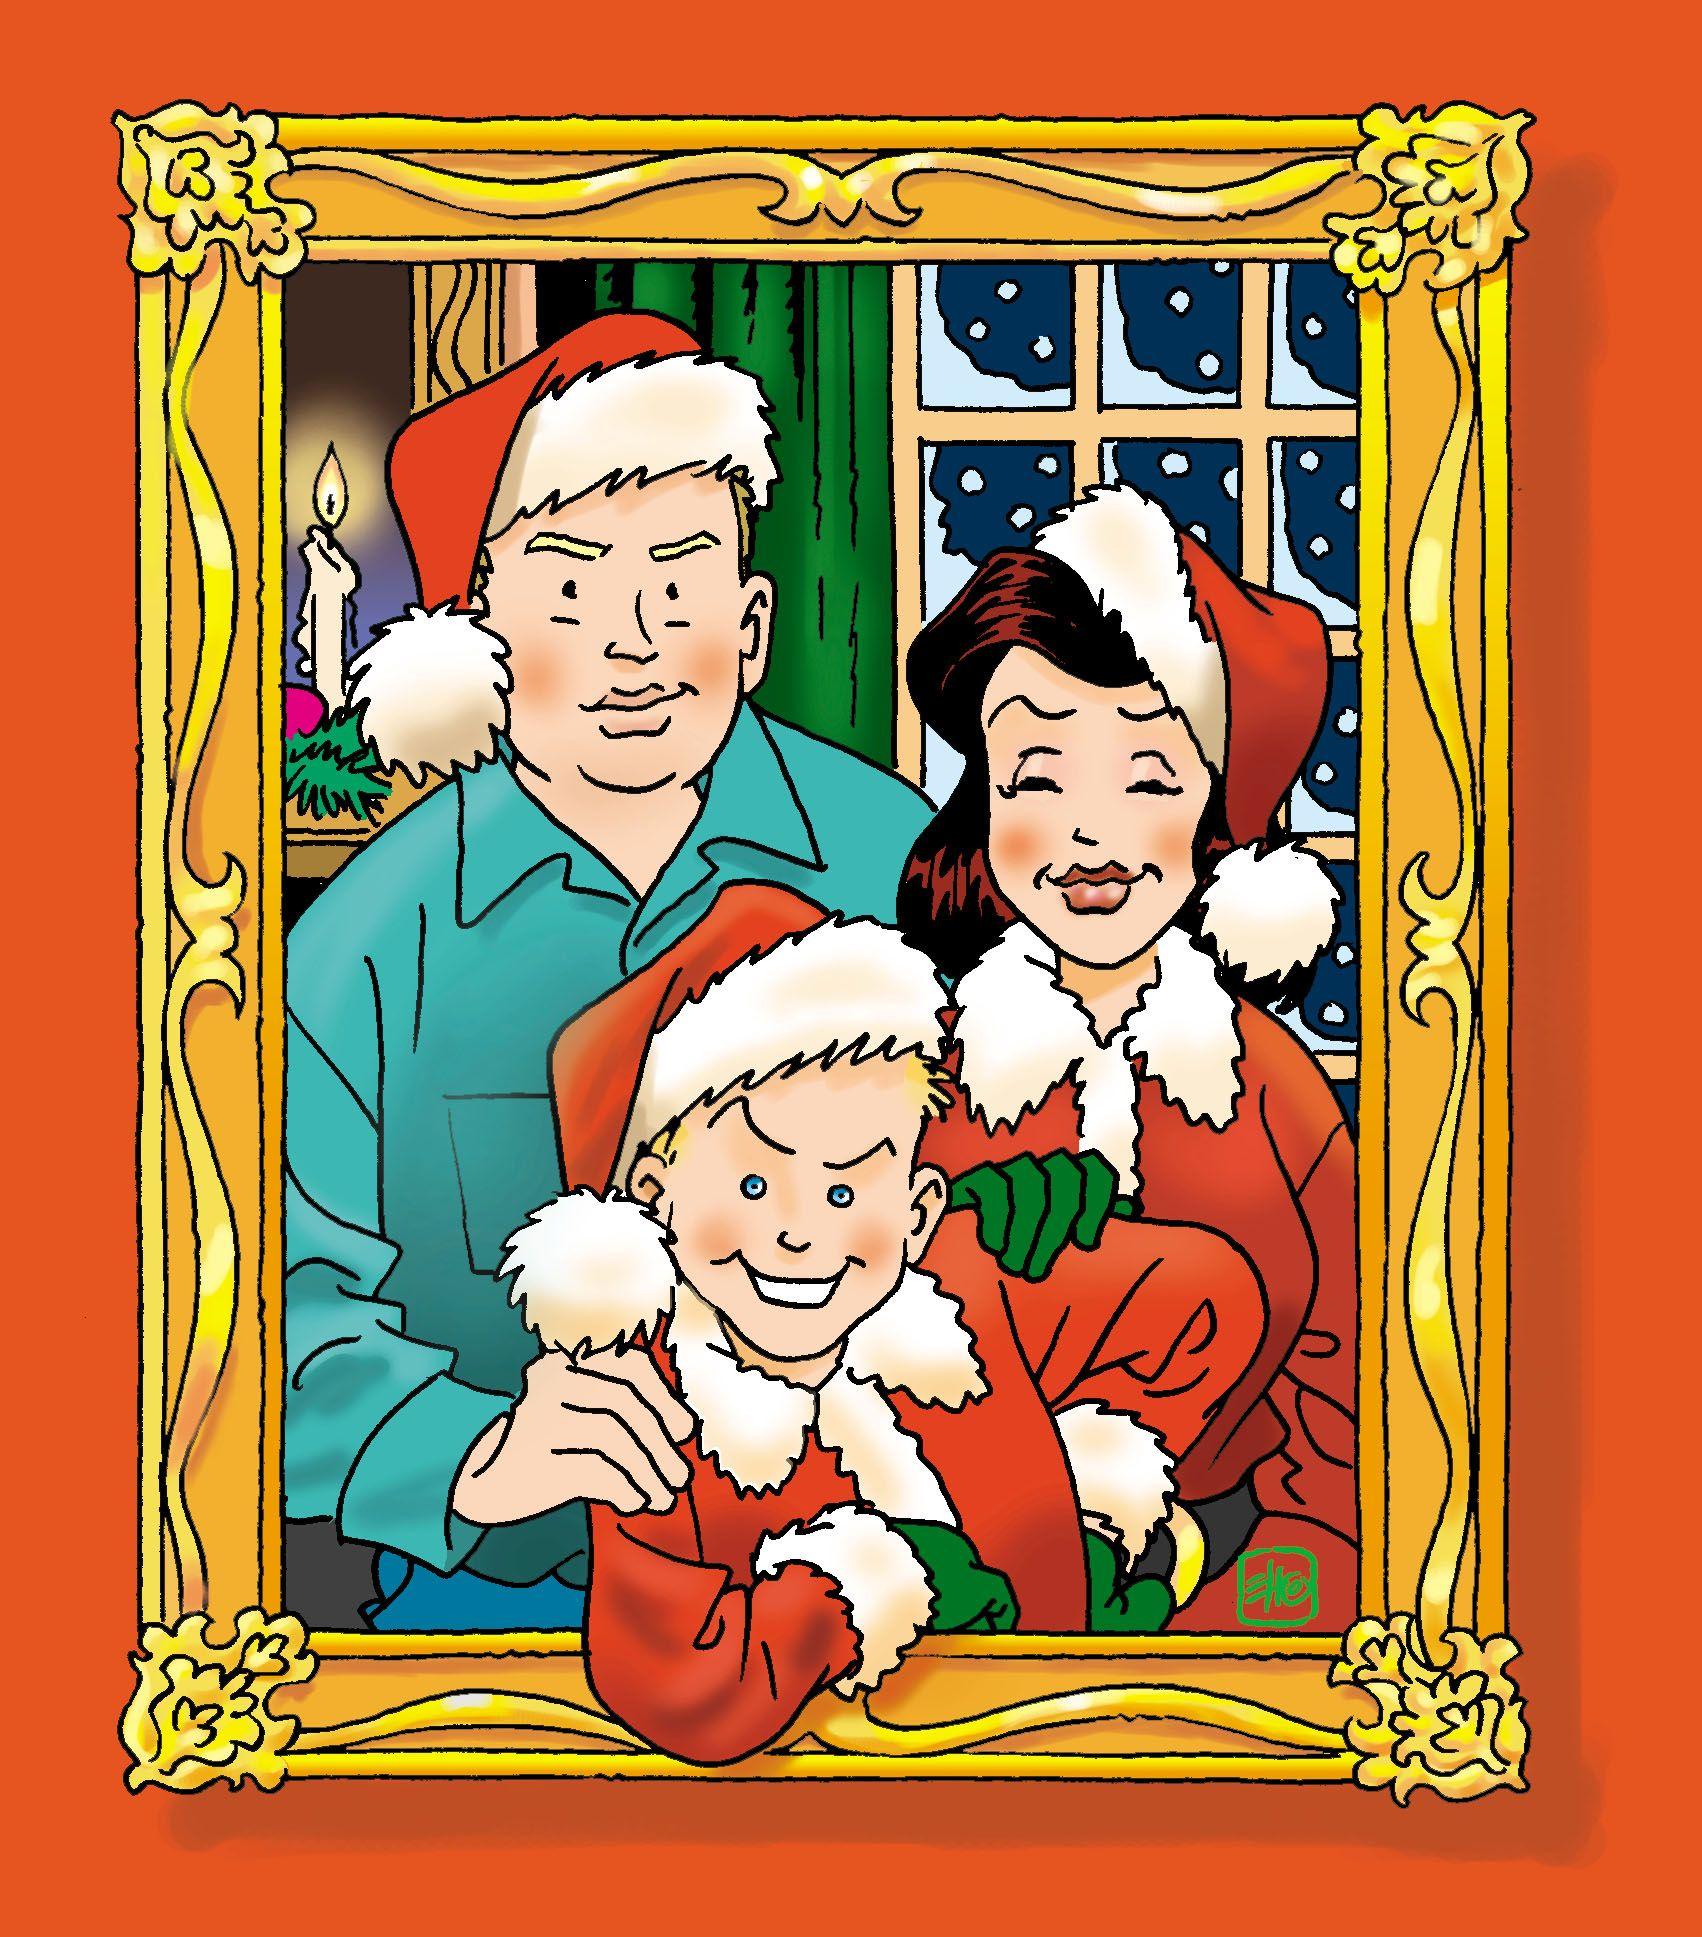 Pin by wim blom on eric heuvel dutch comic artist pinterest comic artist xmas cards dutch christmas greetings cards christmas cards kristyandbryce Choice Image